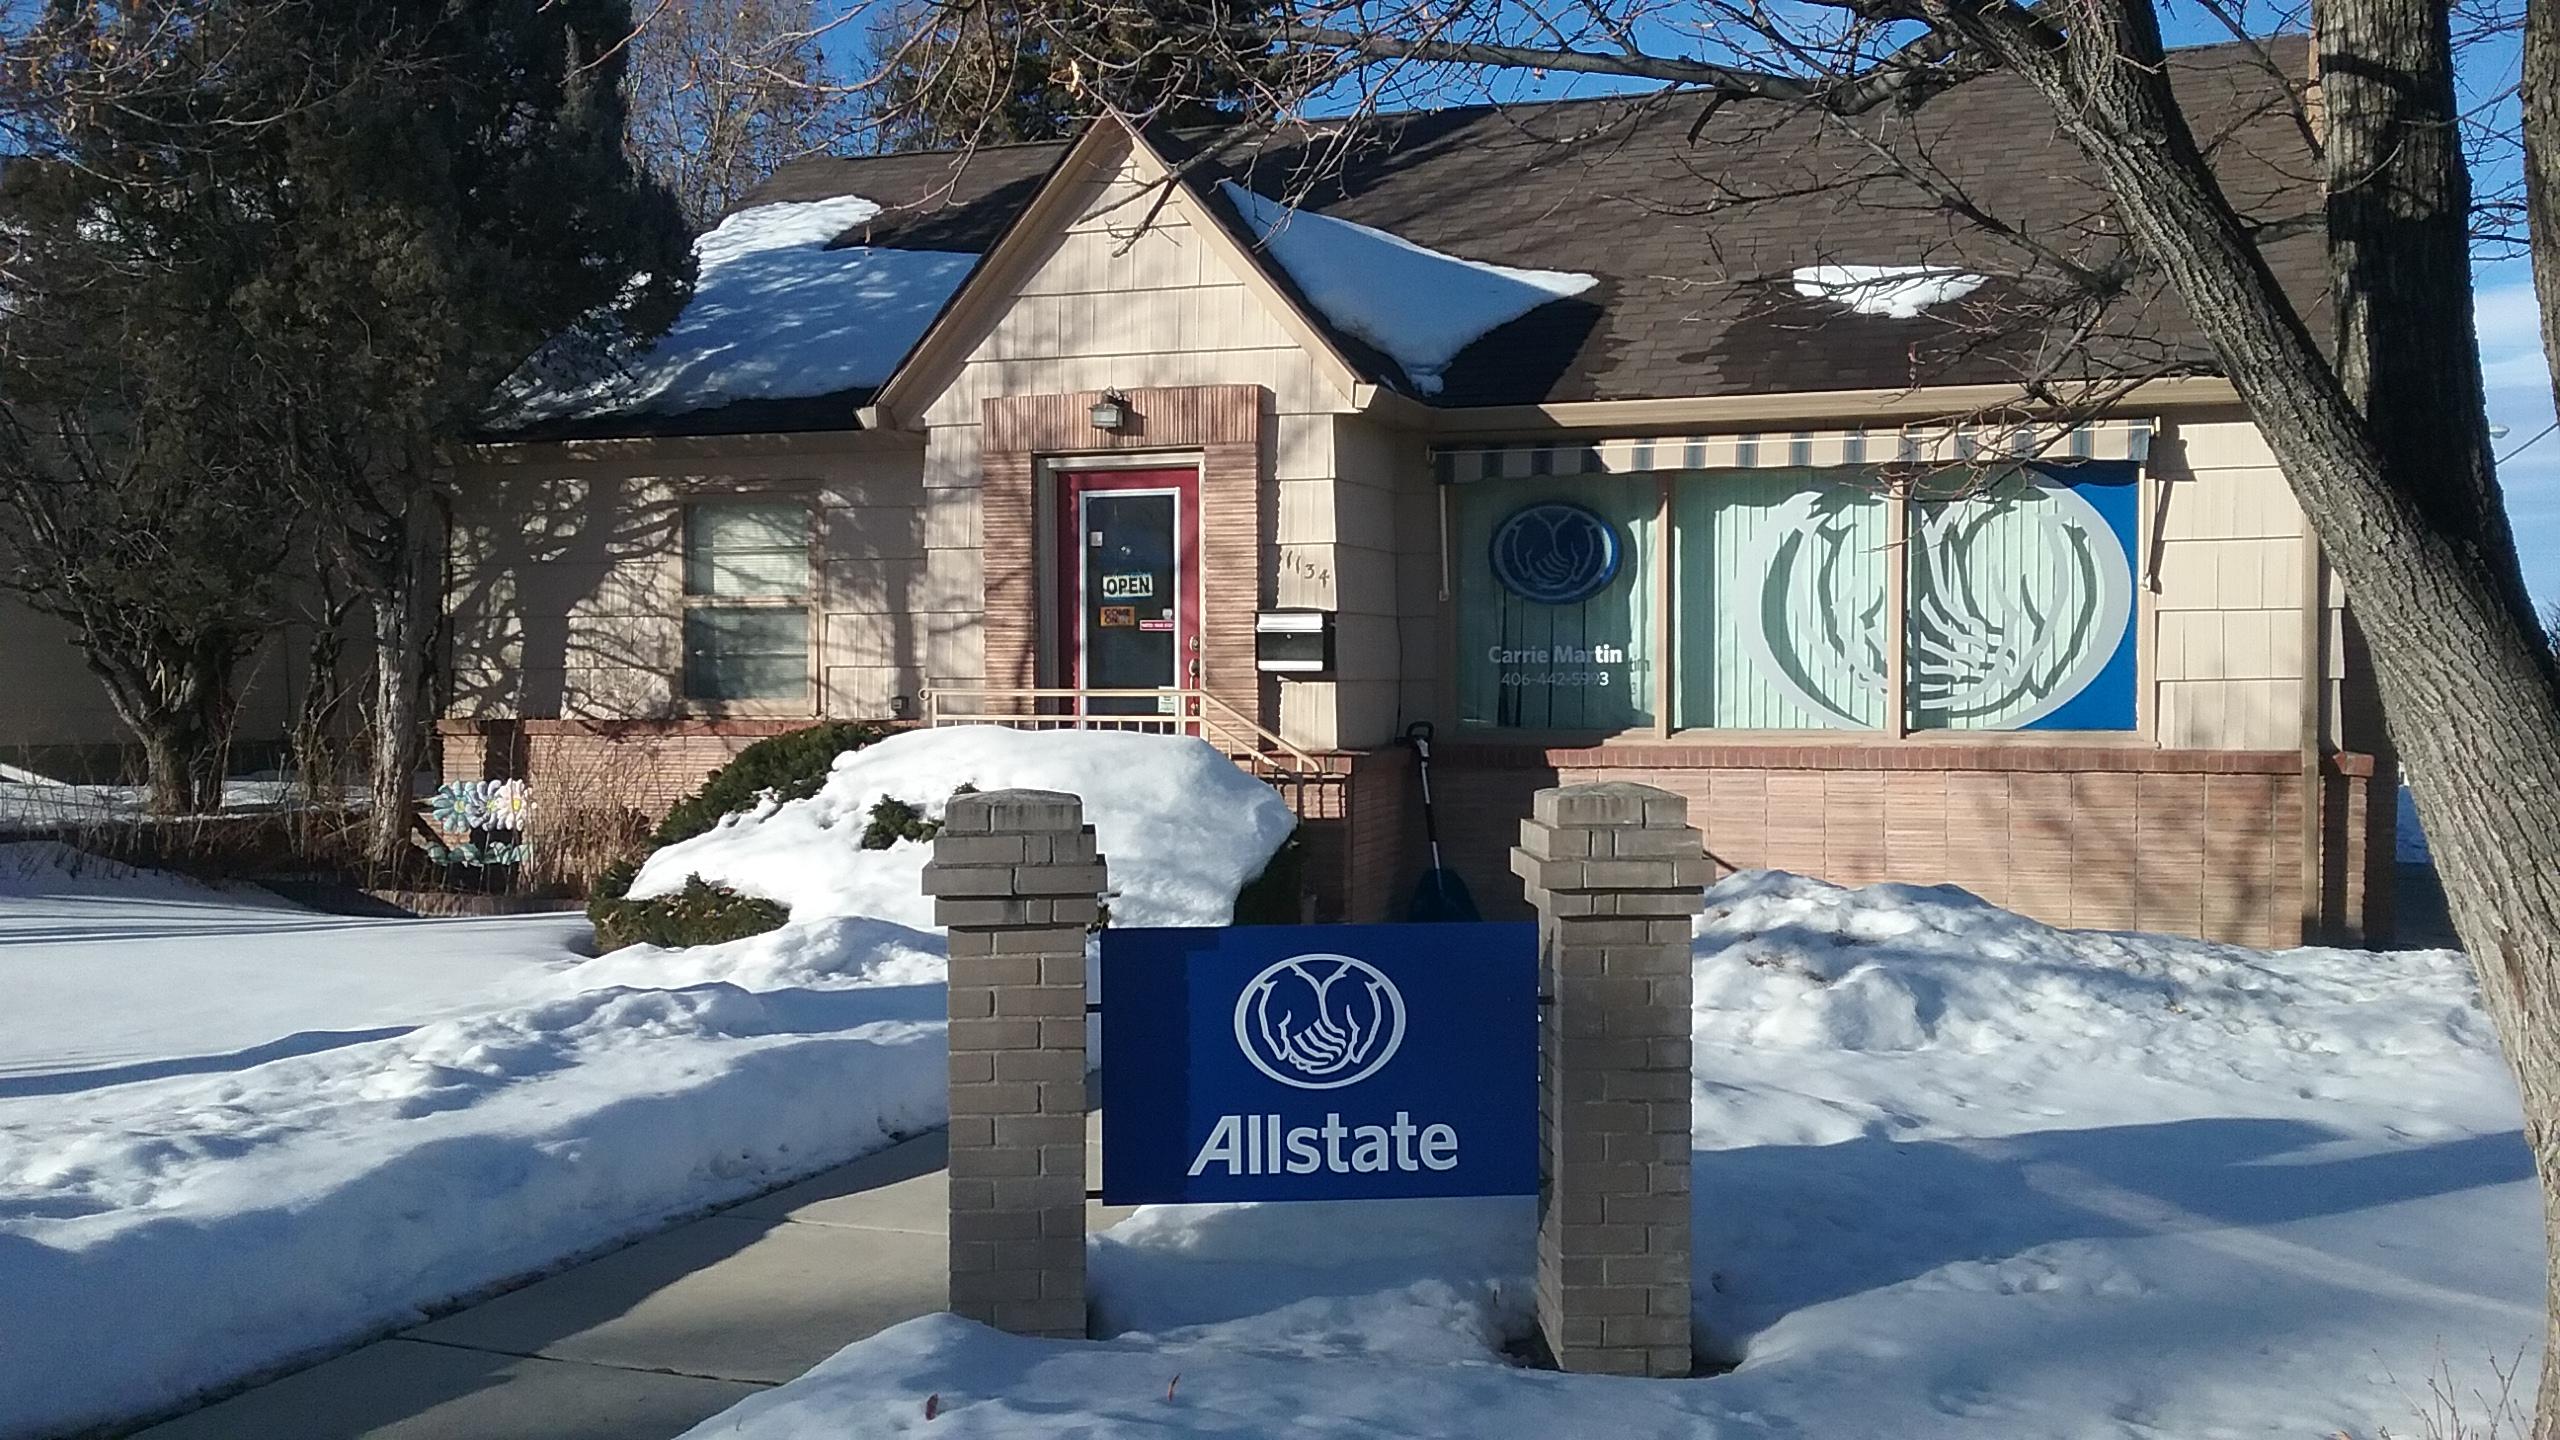 Carrie Martin: Allstate Insurance image 2